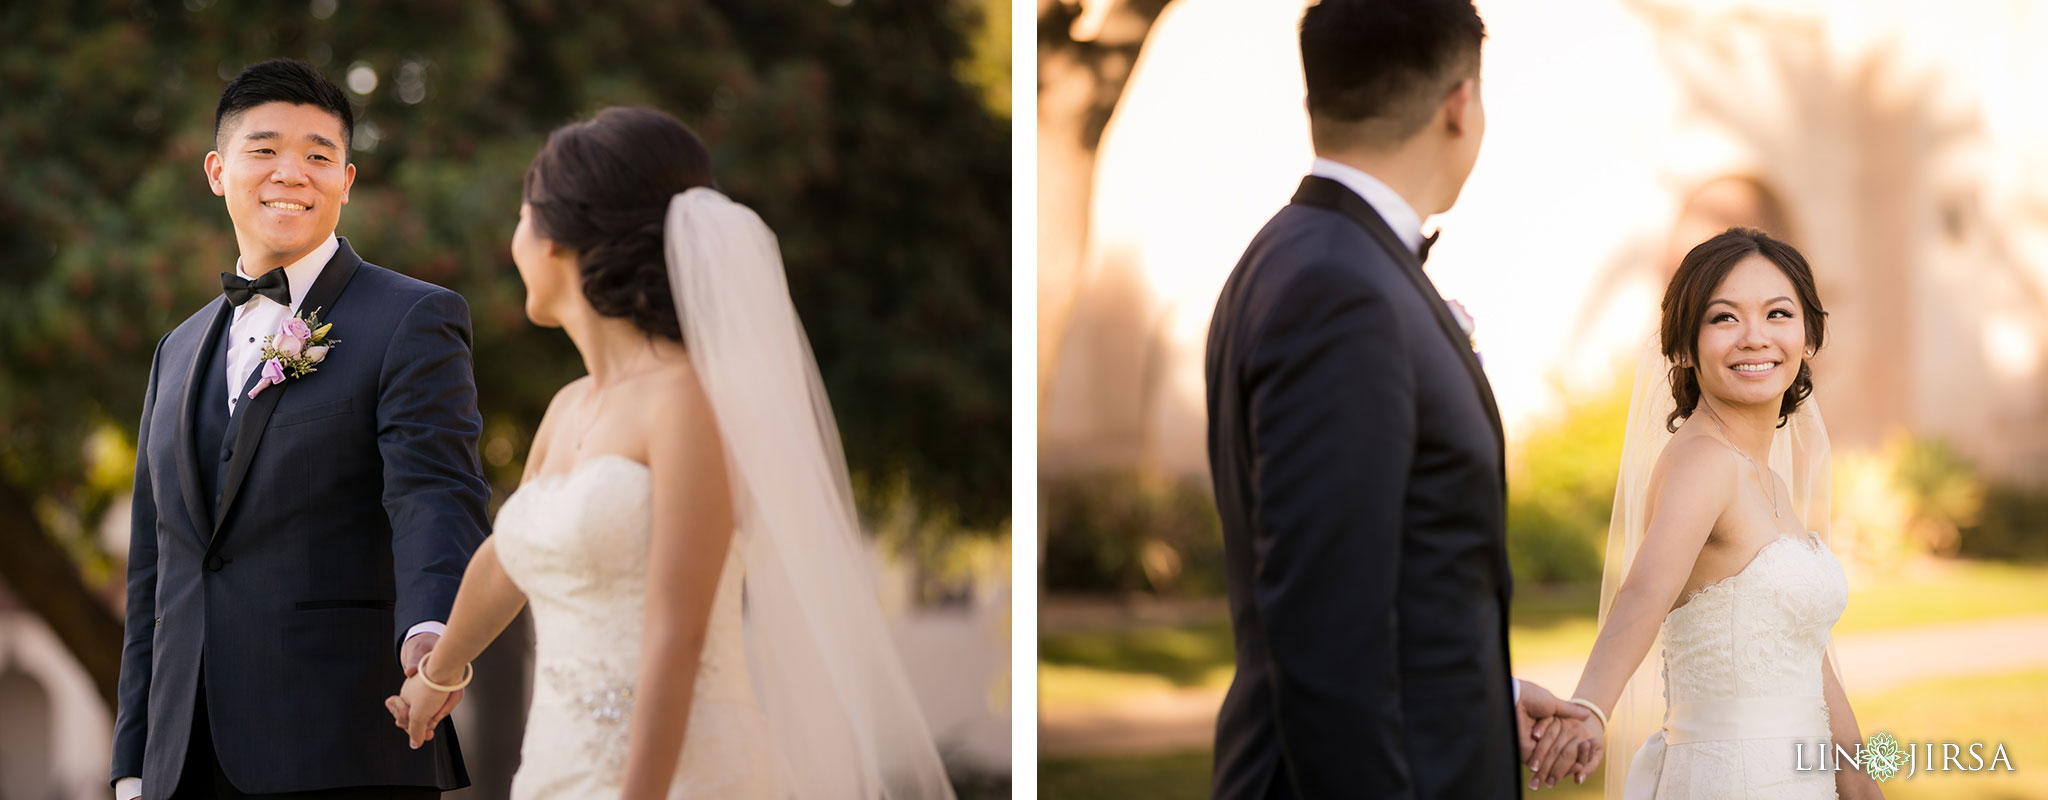 17 orange county wedding photography